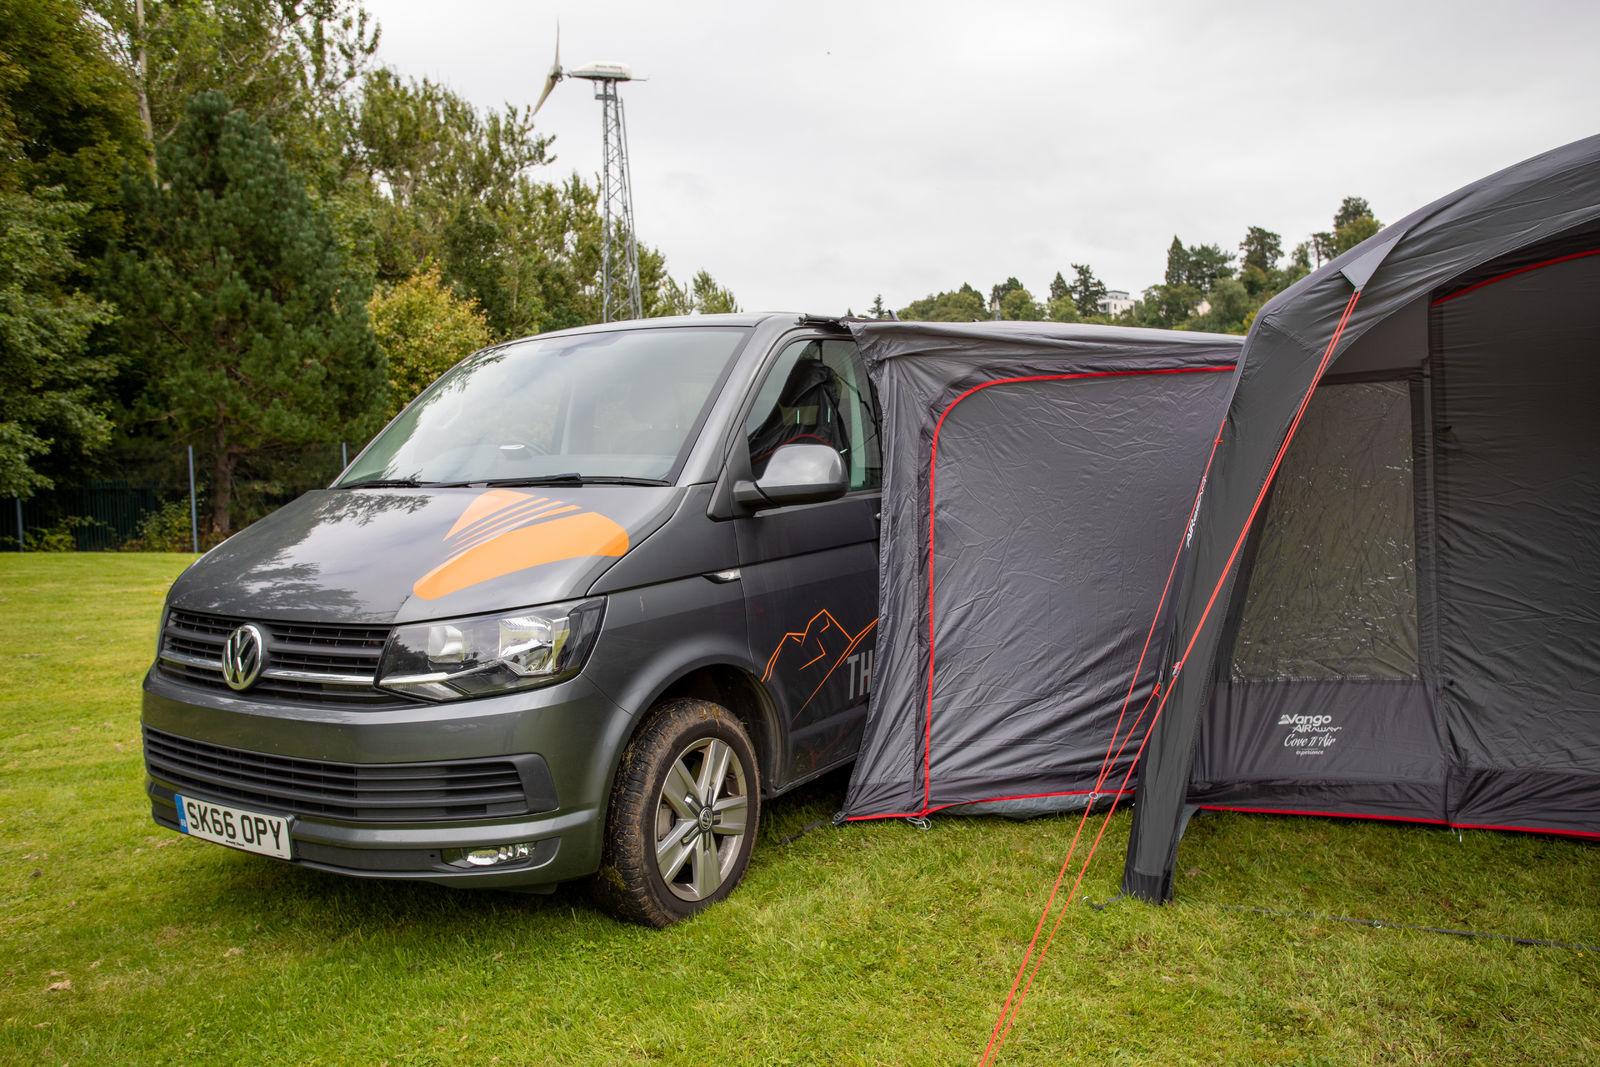 Vango Cove Low 2021 Norwich Camping 5